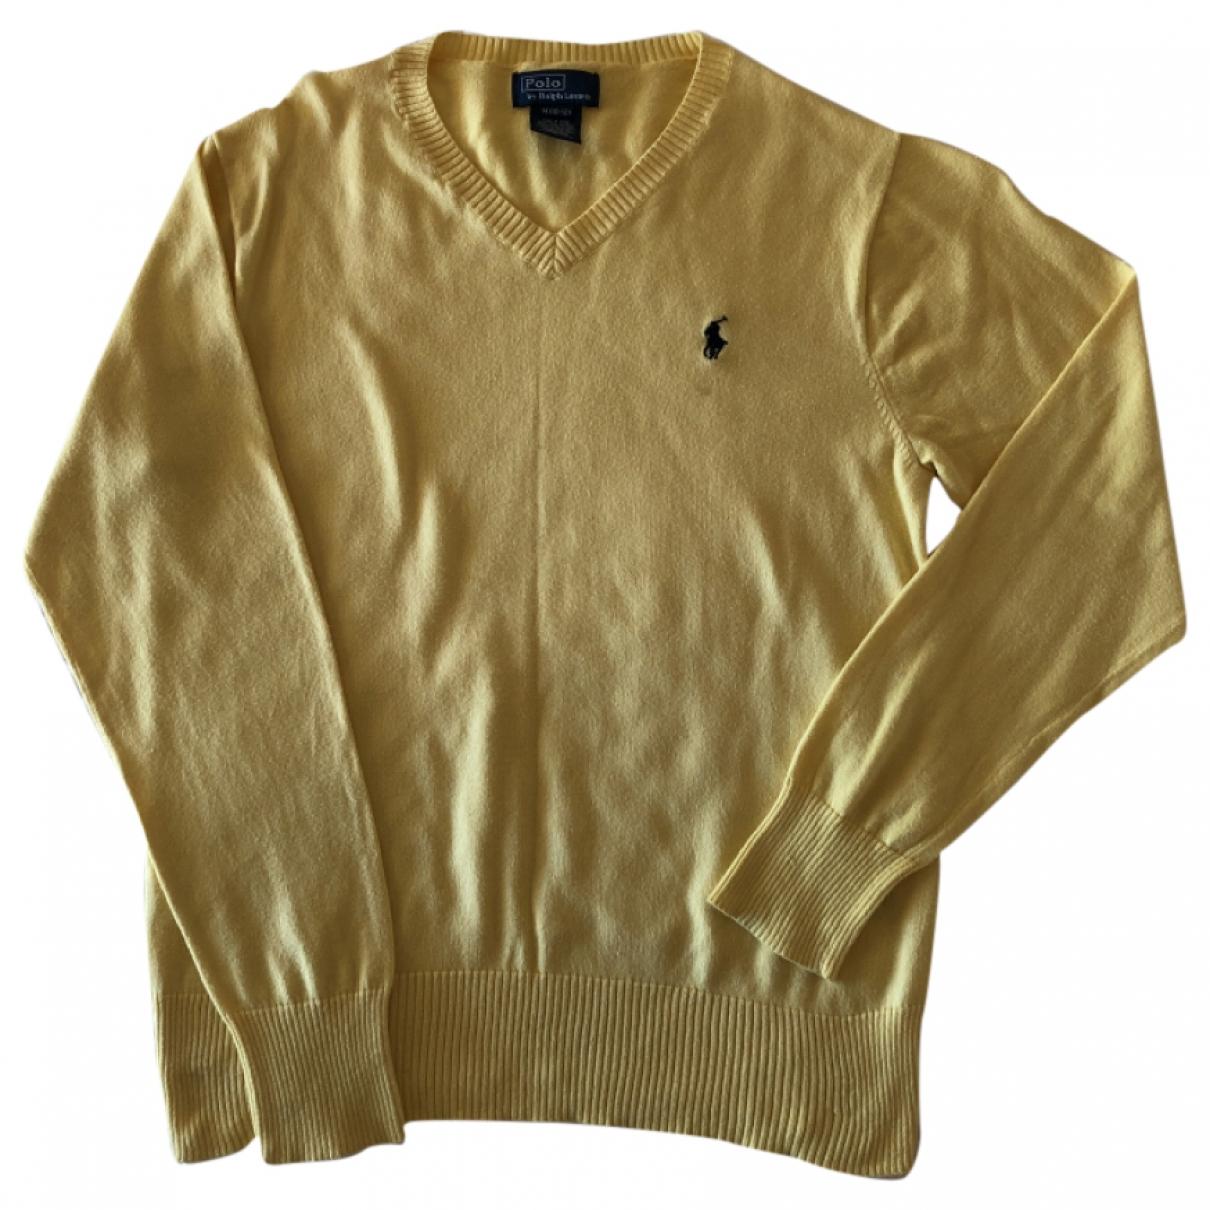 Polo Ralph Lauren \N Yellow Cotton Knitwear for Kids 12 years - XS FR